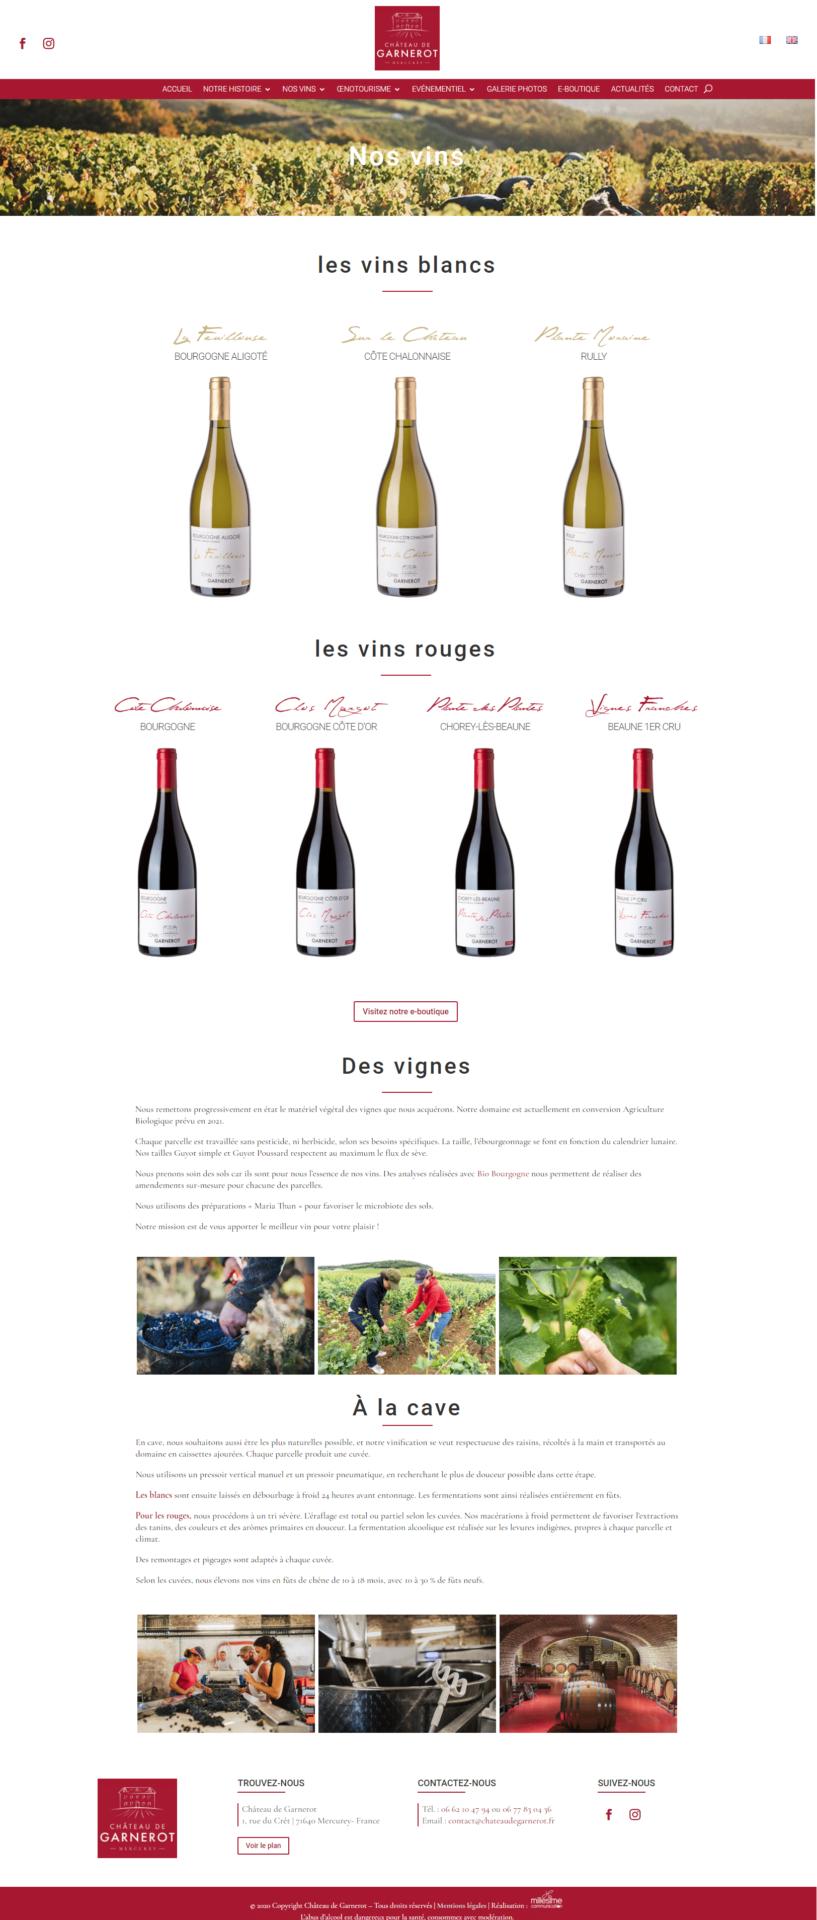 Château de Garnerot - Site internet - Nos vins